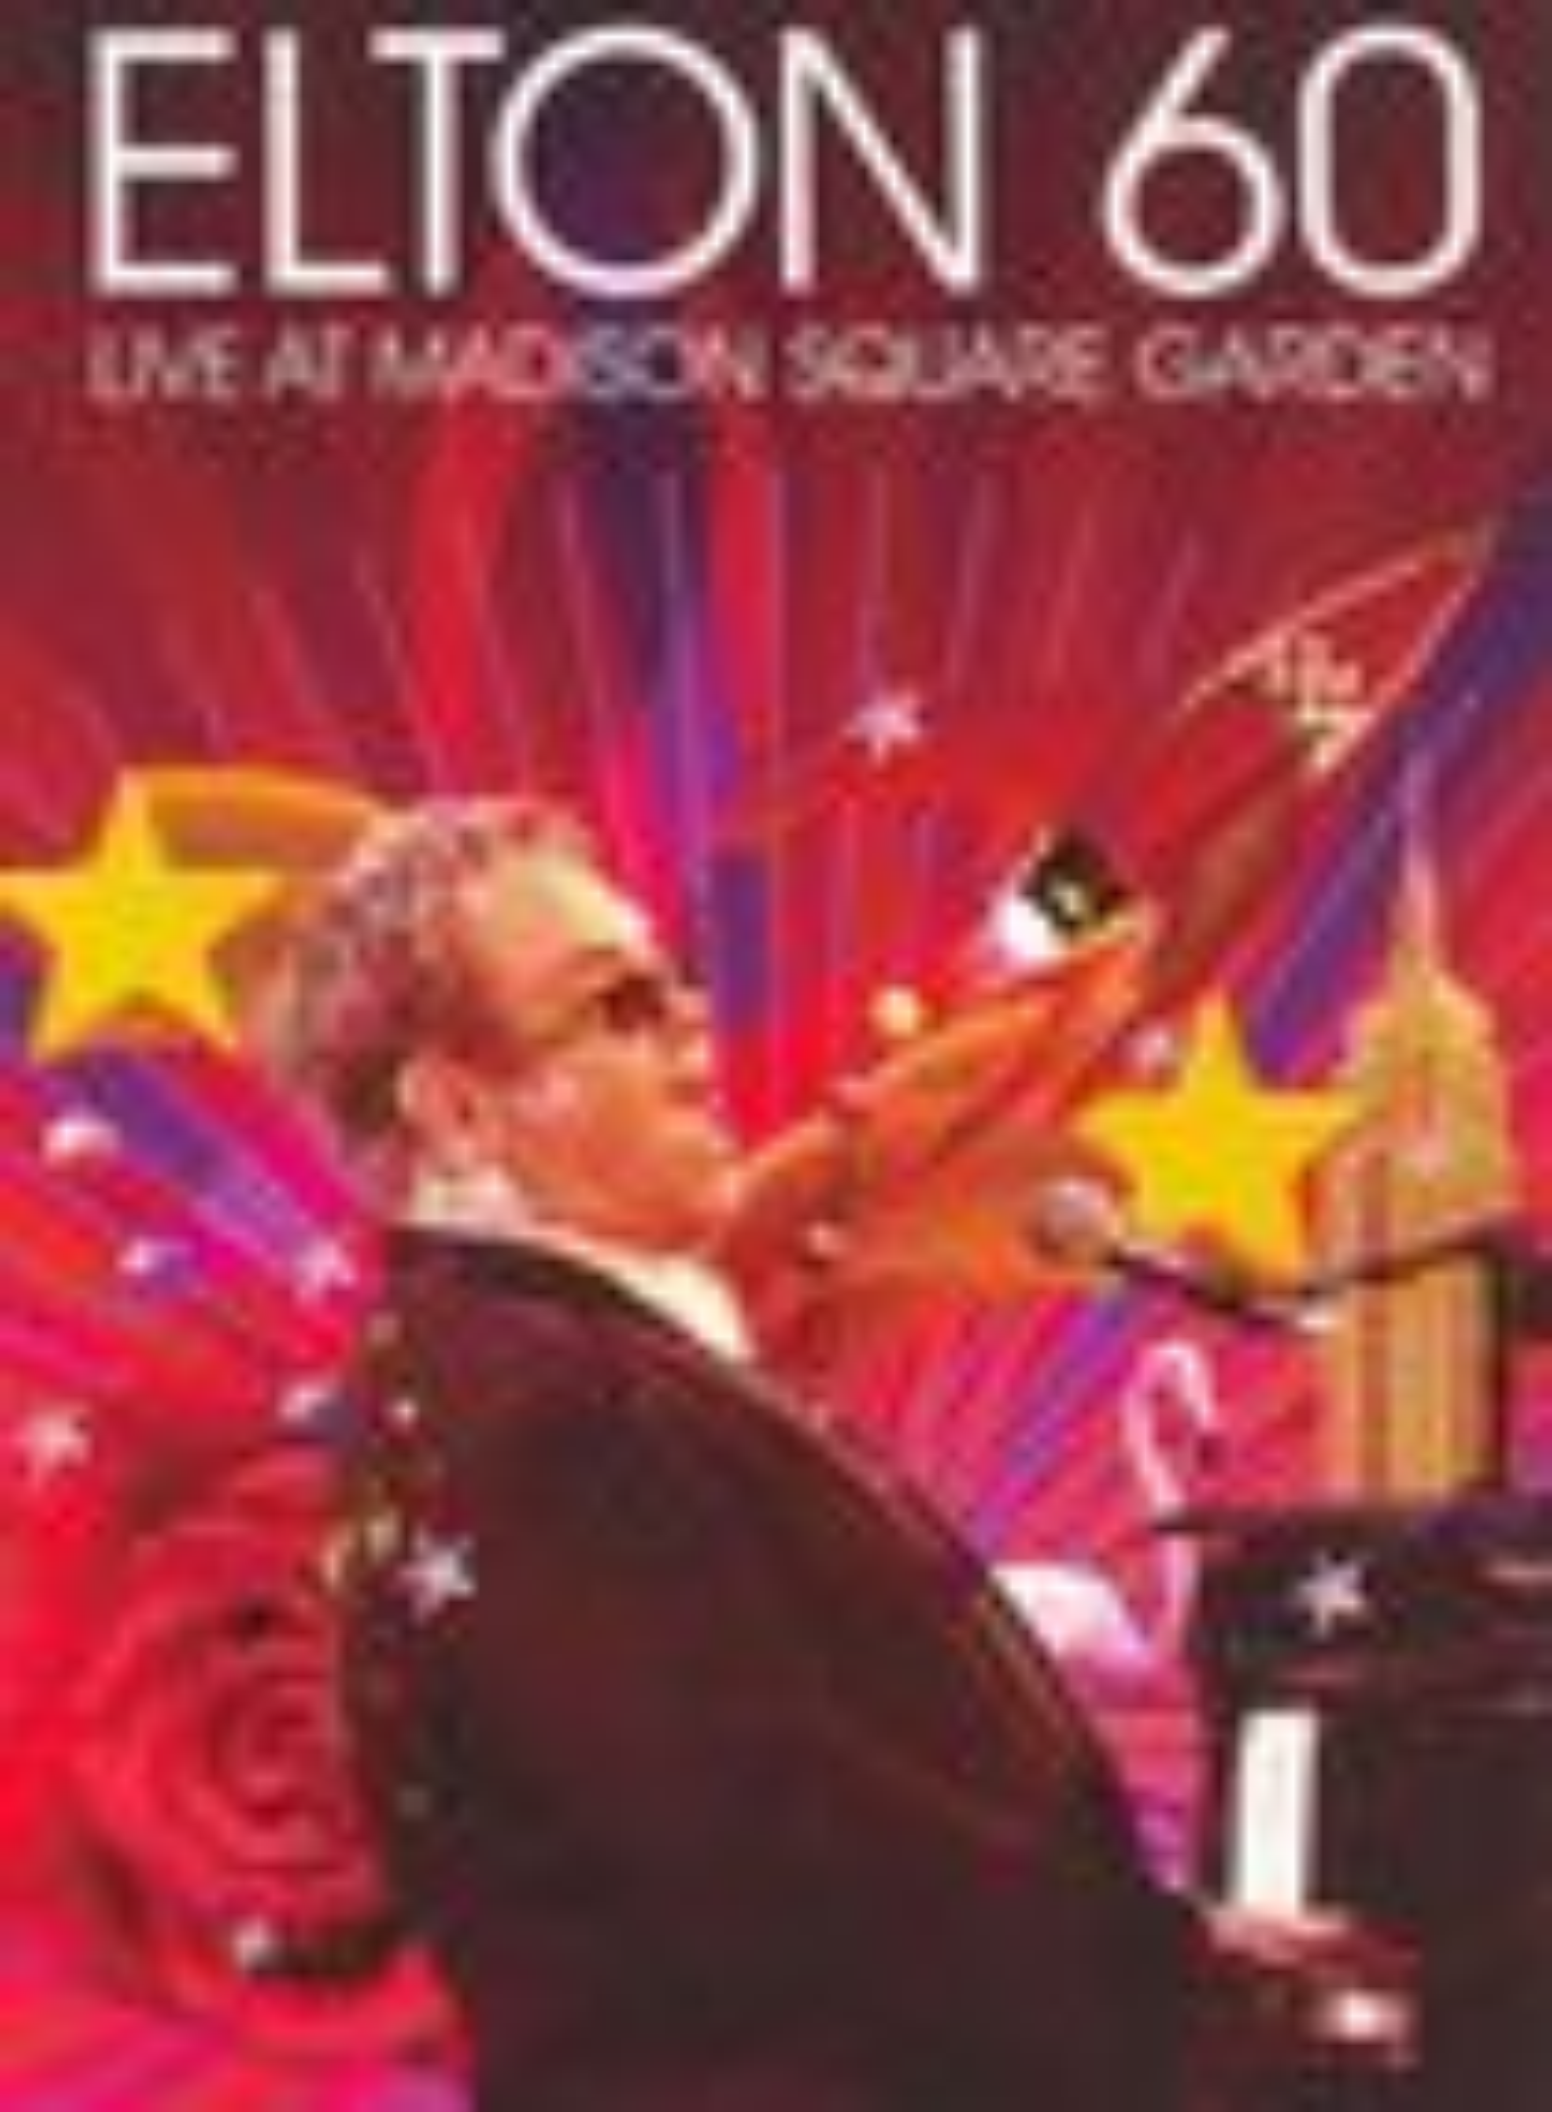 Elton John: Elton 60 - Live At Madison Square Garden (dvd) 8518703